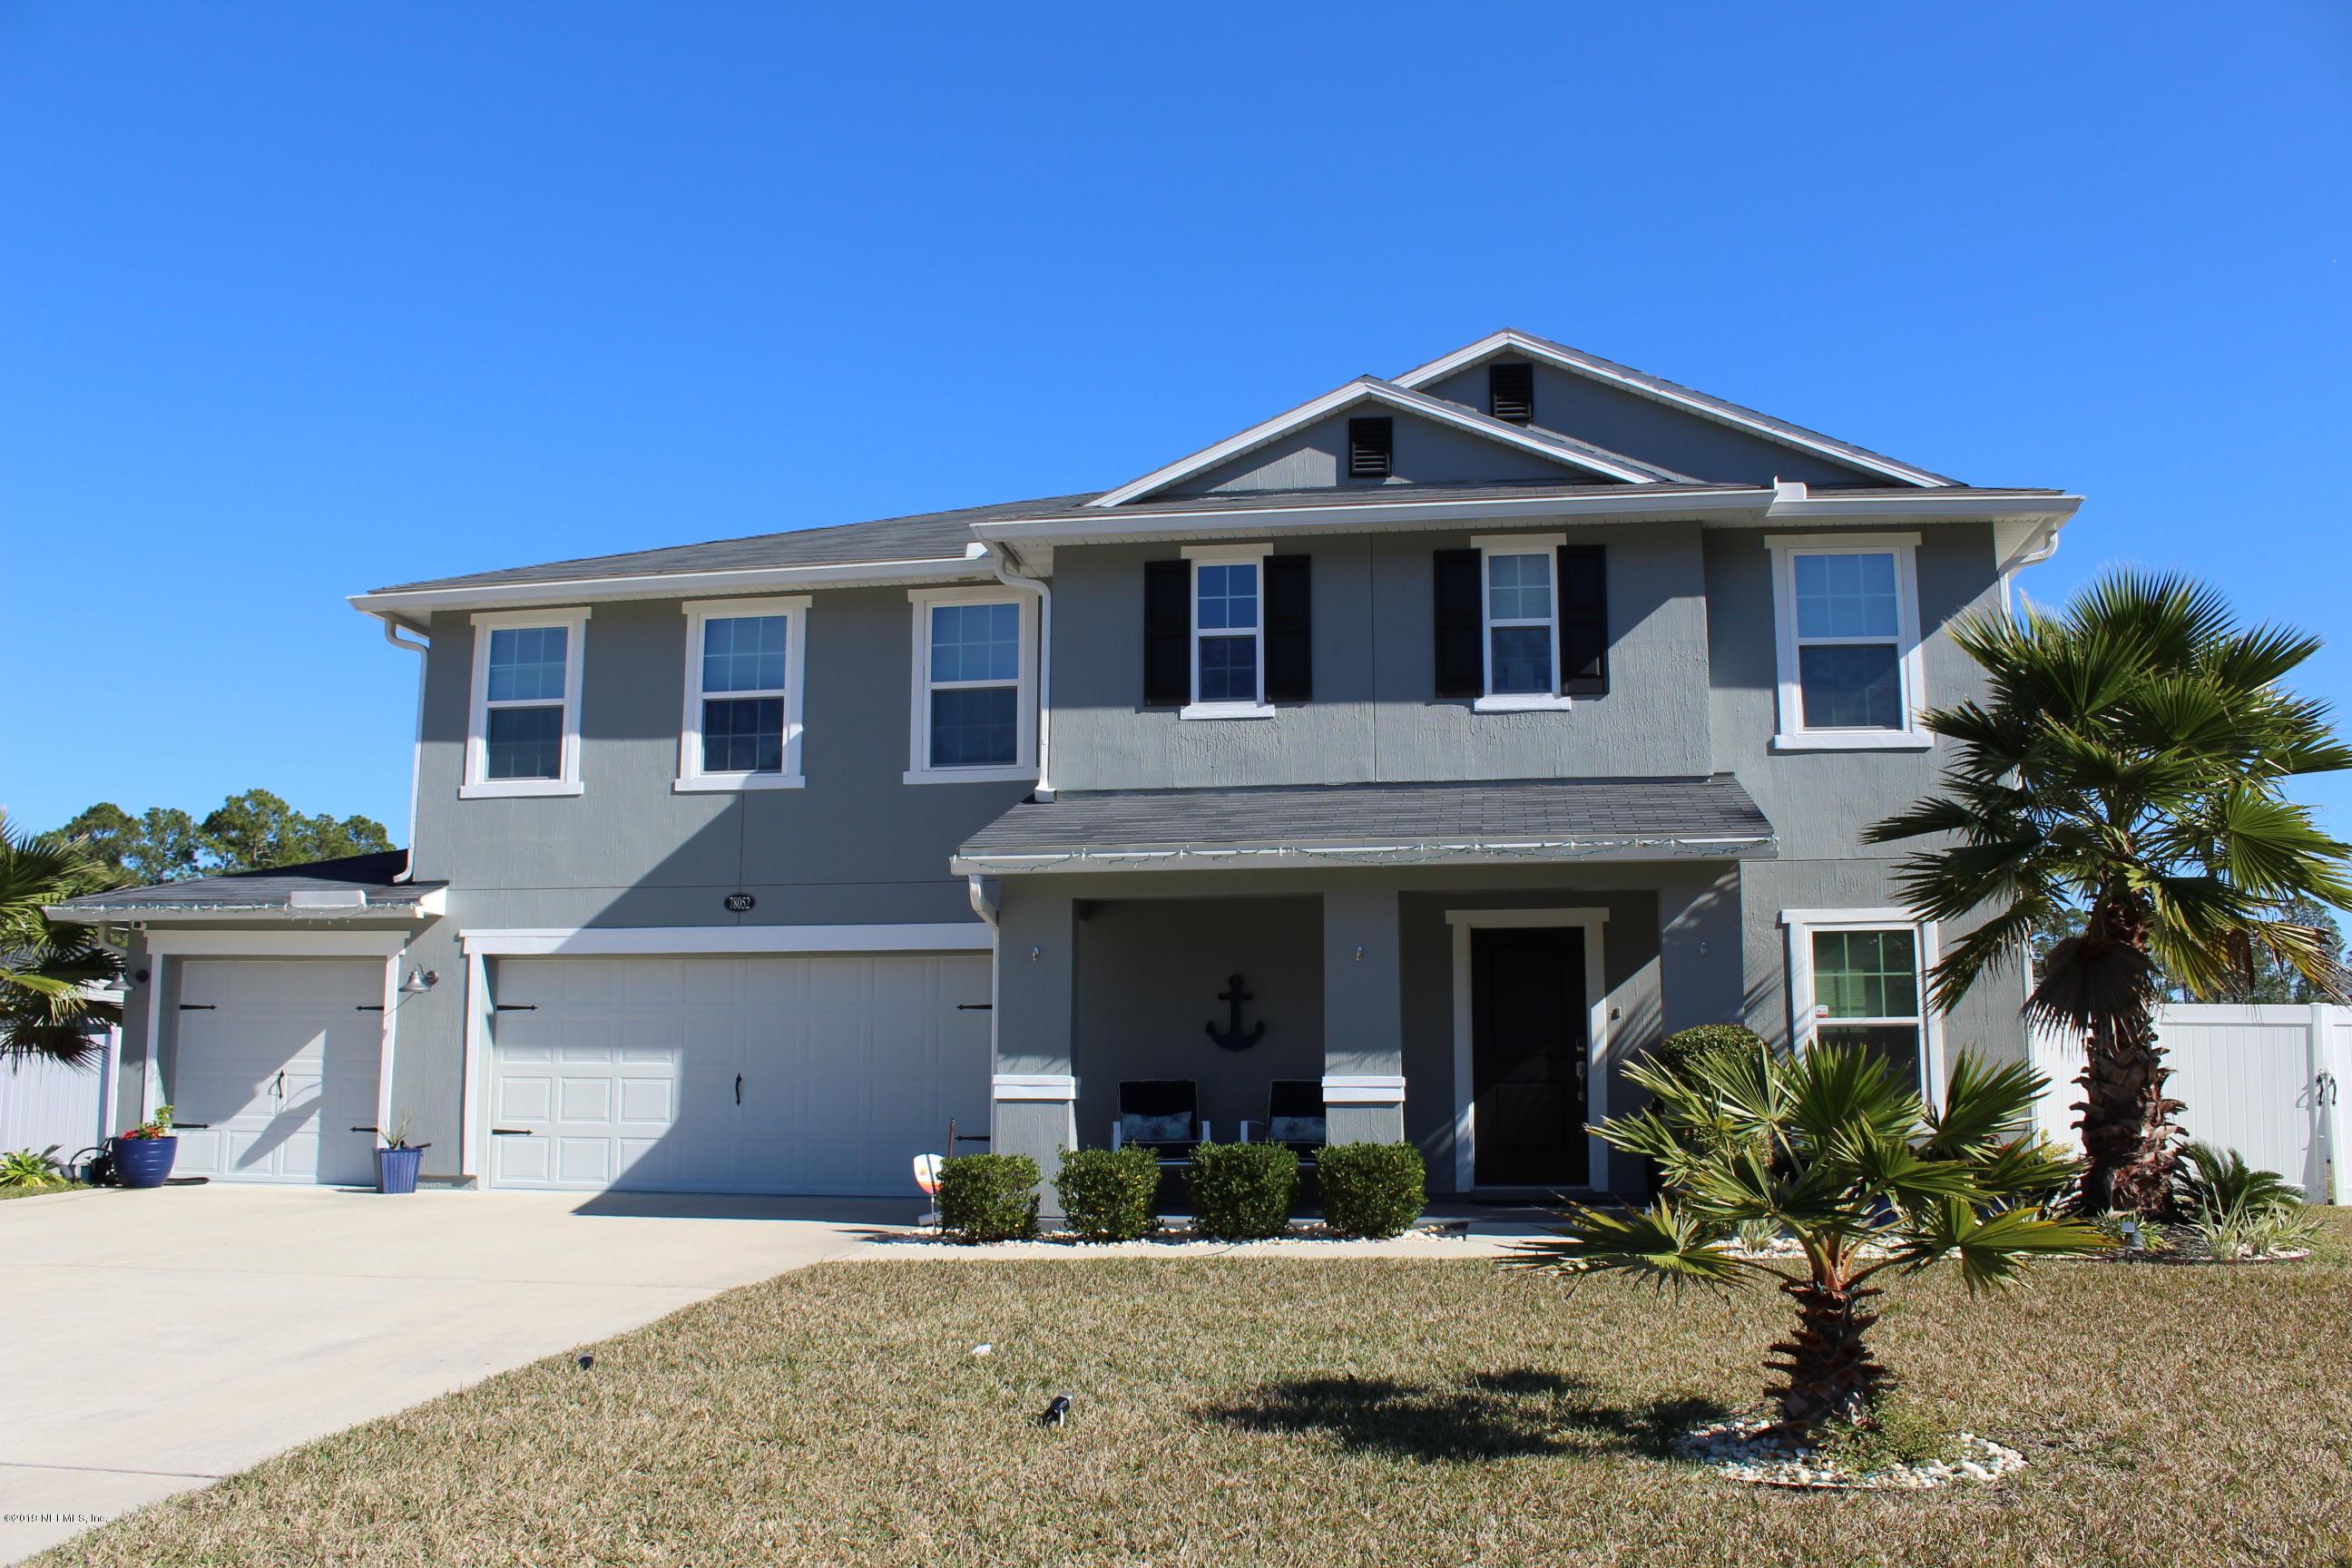 78052 UNDERWOOD, YULEE, FLORIDA 32097, 4 Bedrooms Bedrooms, ,2 BathroomsBathrooms,Residential - single family,For sale,UNDERWOOD,974965